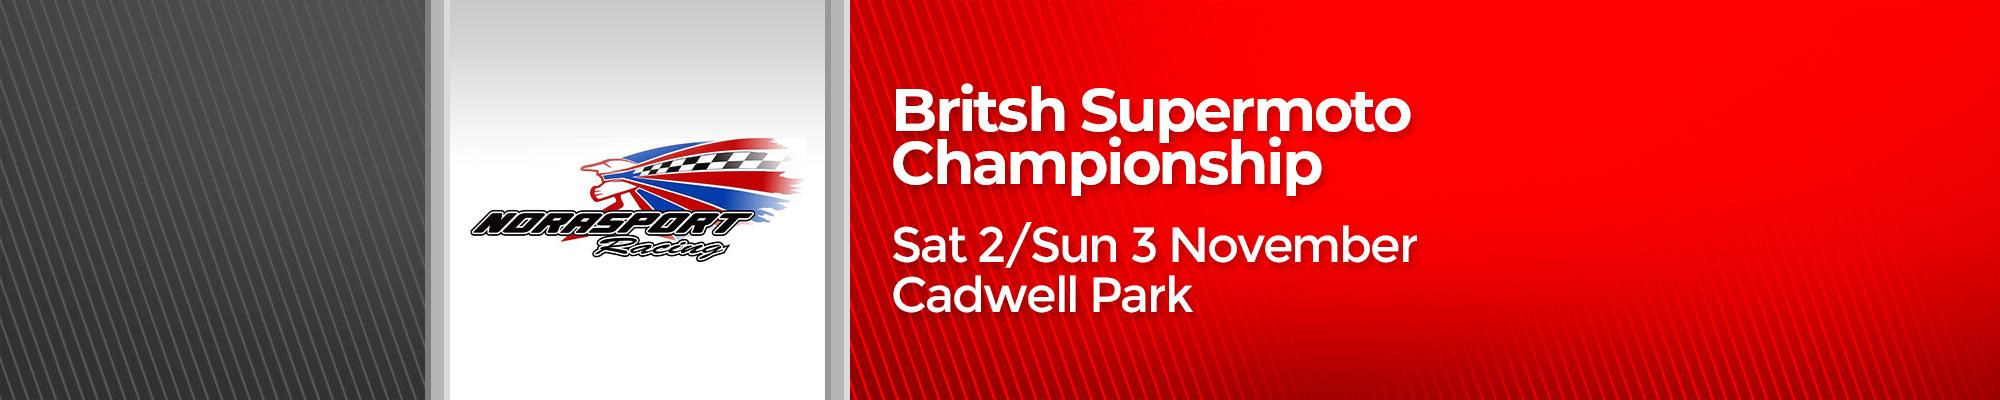 British Supermoto Championships